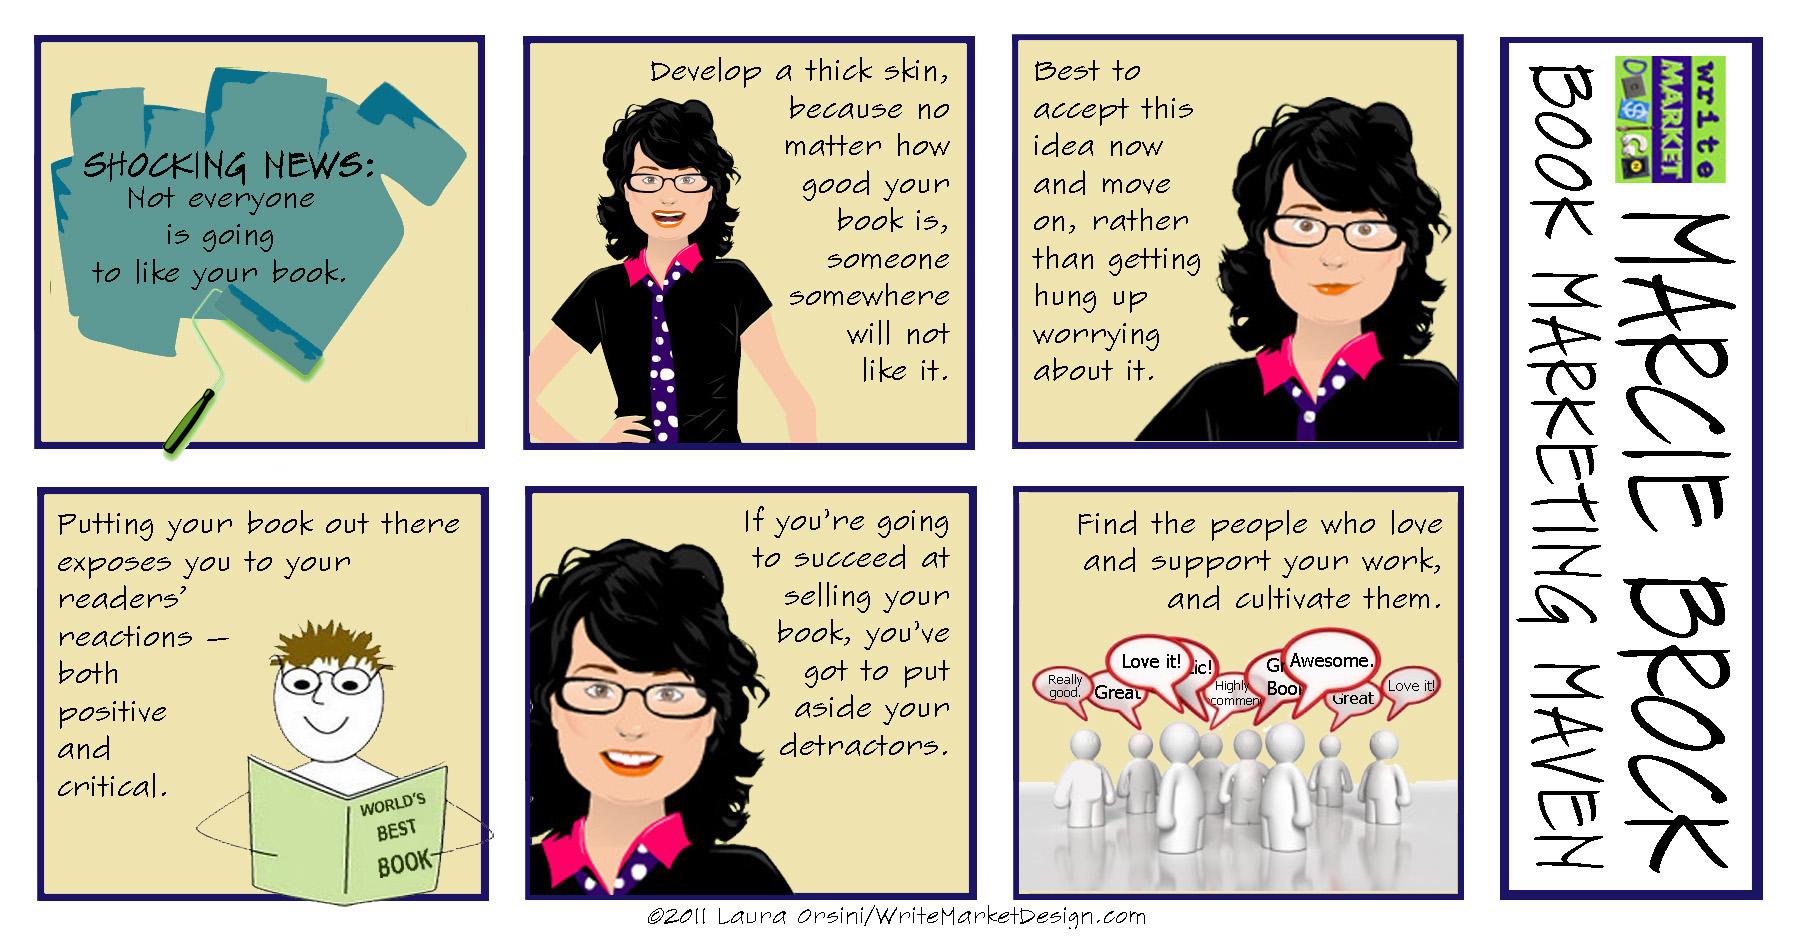 Do the write thing essay contest 2011